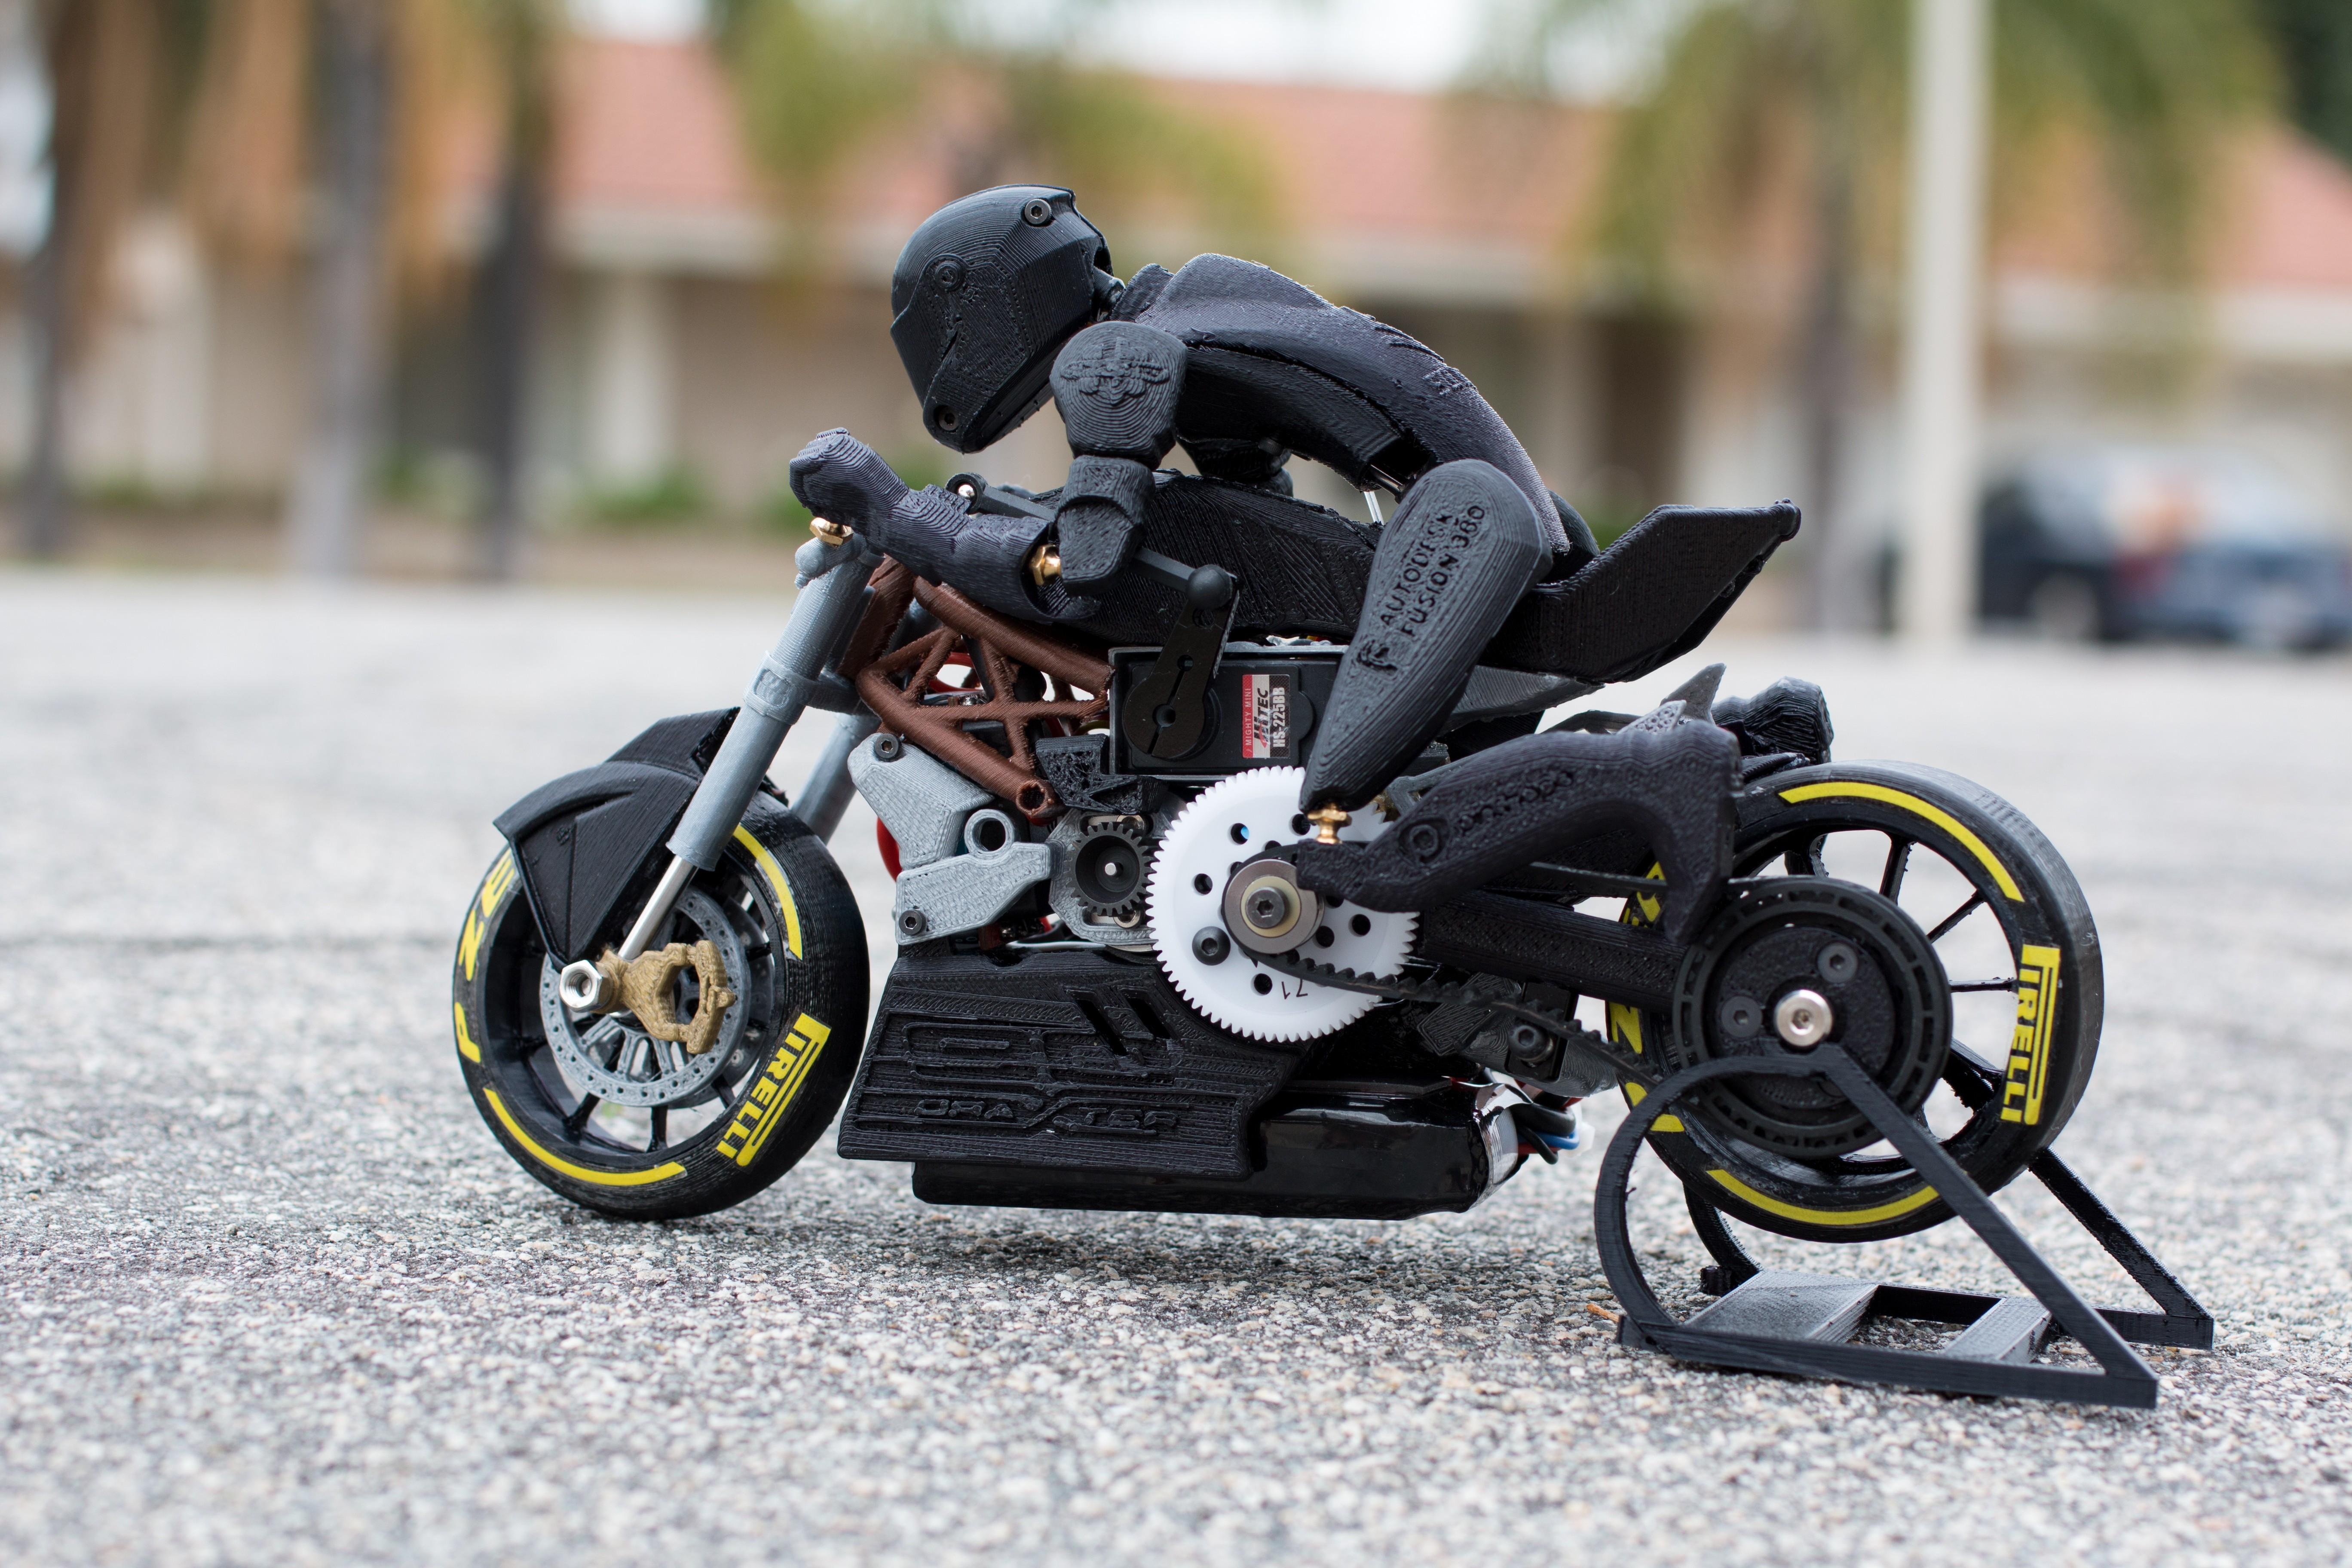 _MG_4459.jpg Download free STL file 2016 Ducati Draxter Concept Drag Bike RC • 3D printer template, brett